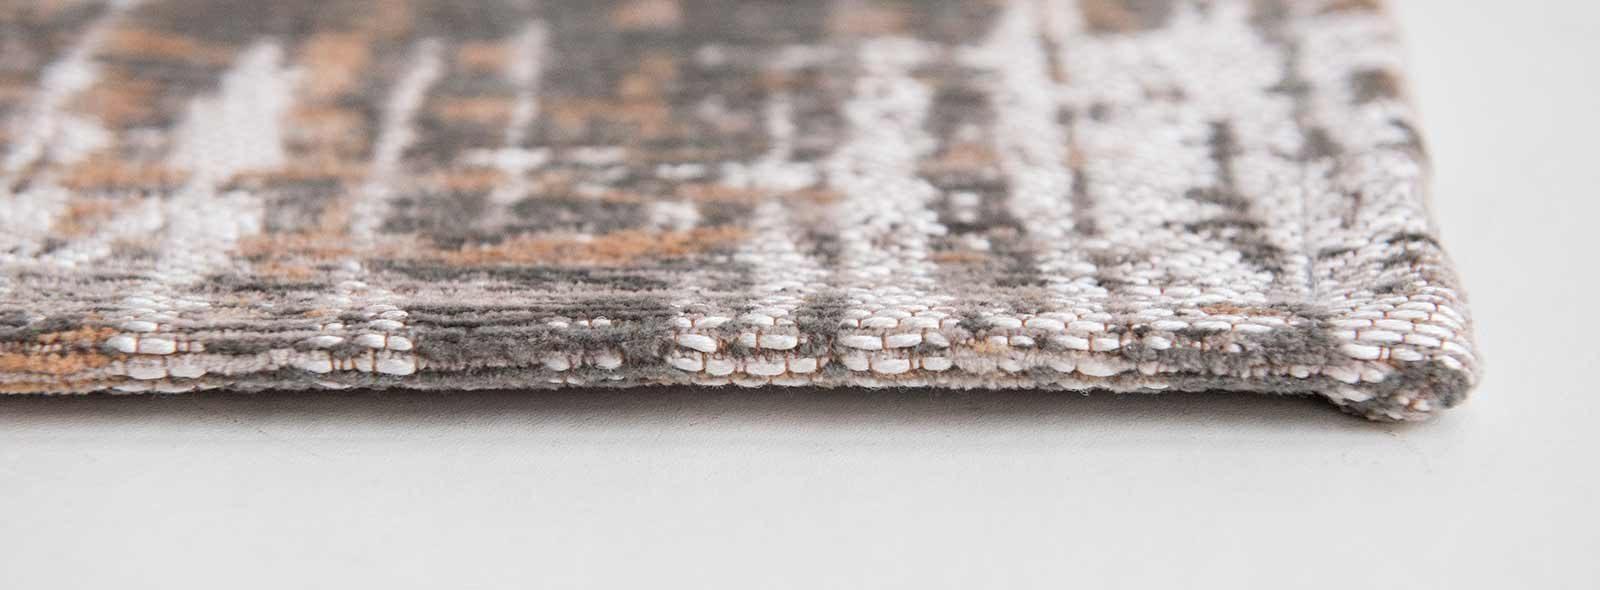 alfombras Louis De Poortere LX8717 Atlantic Streaks Parsons Powder side